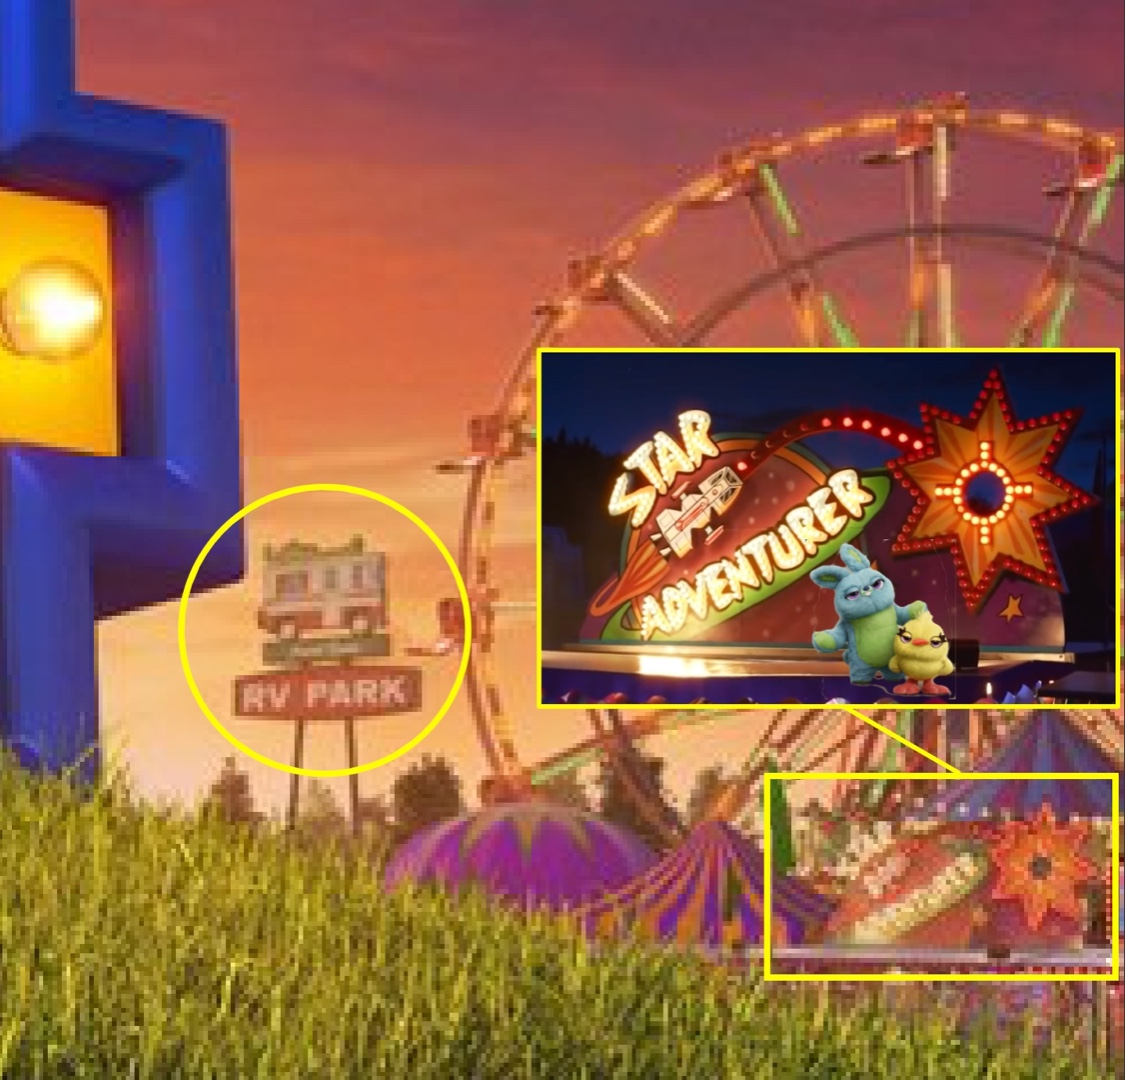 Toy-Story-4-RV-Park-Star-Adventurer.jpg